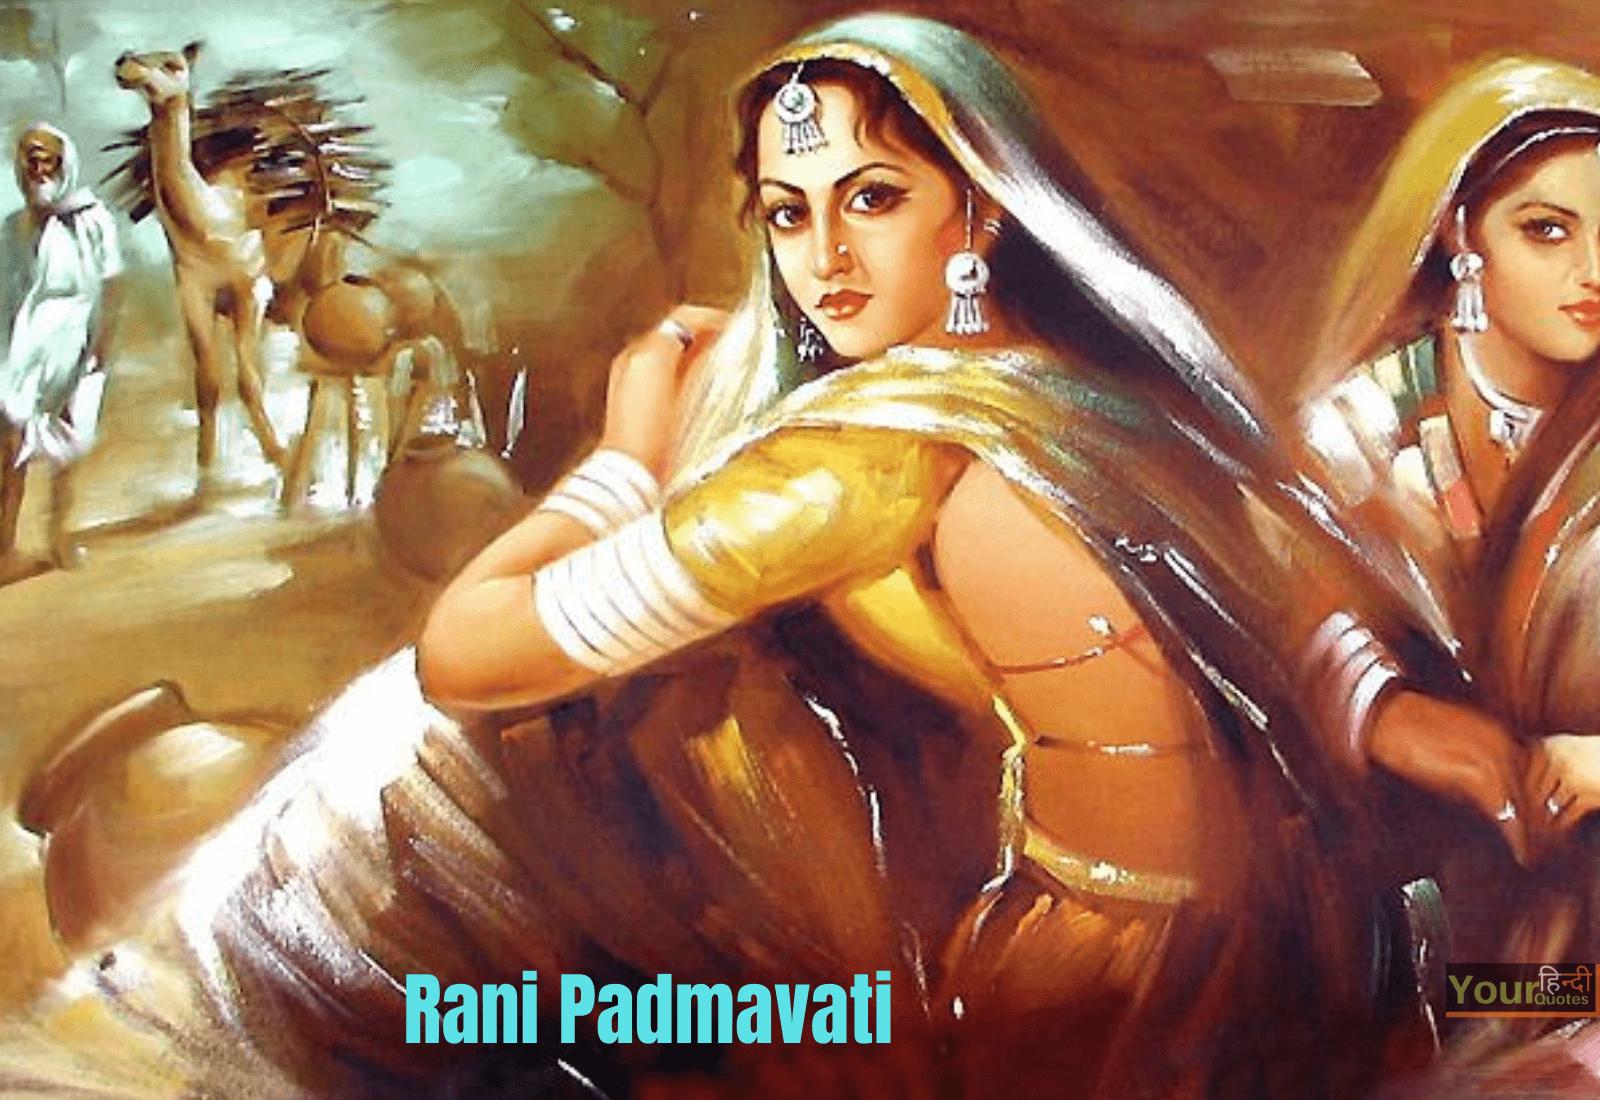 Rani Padmavati Picture